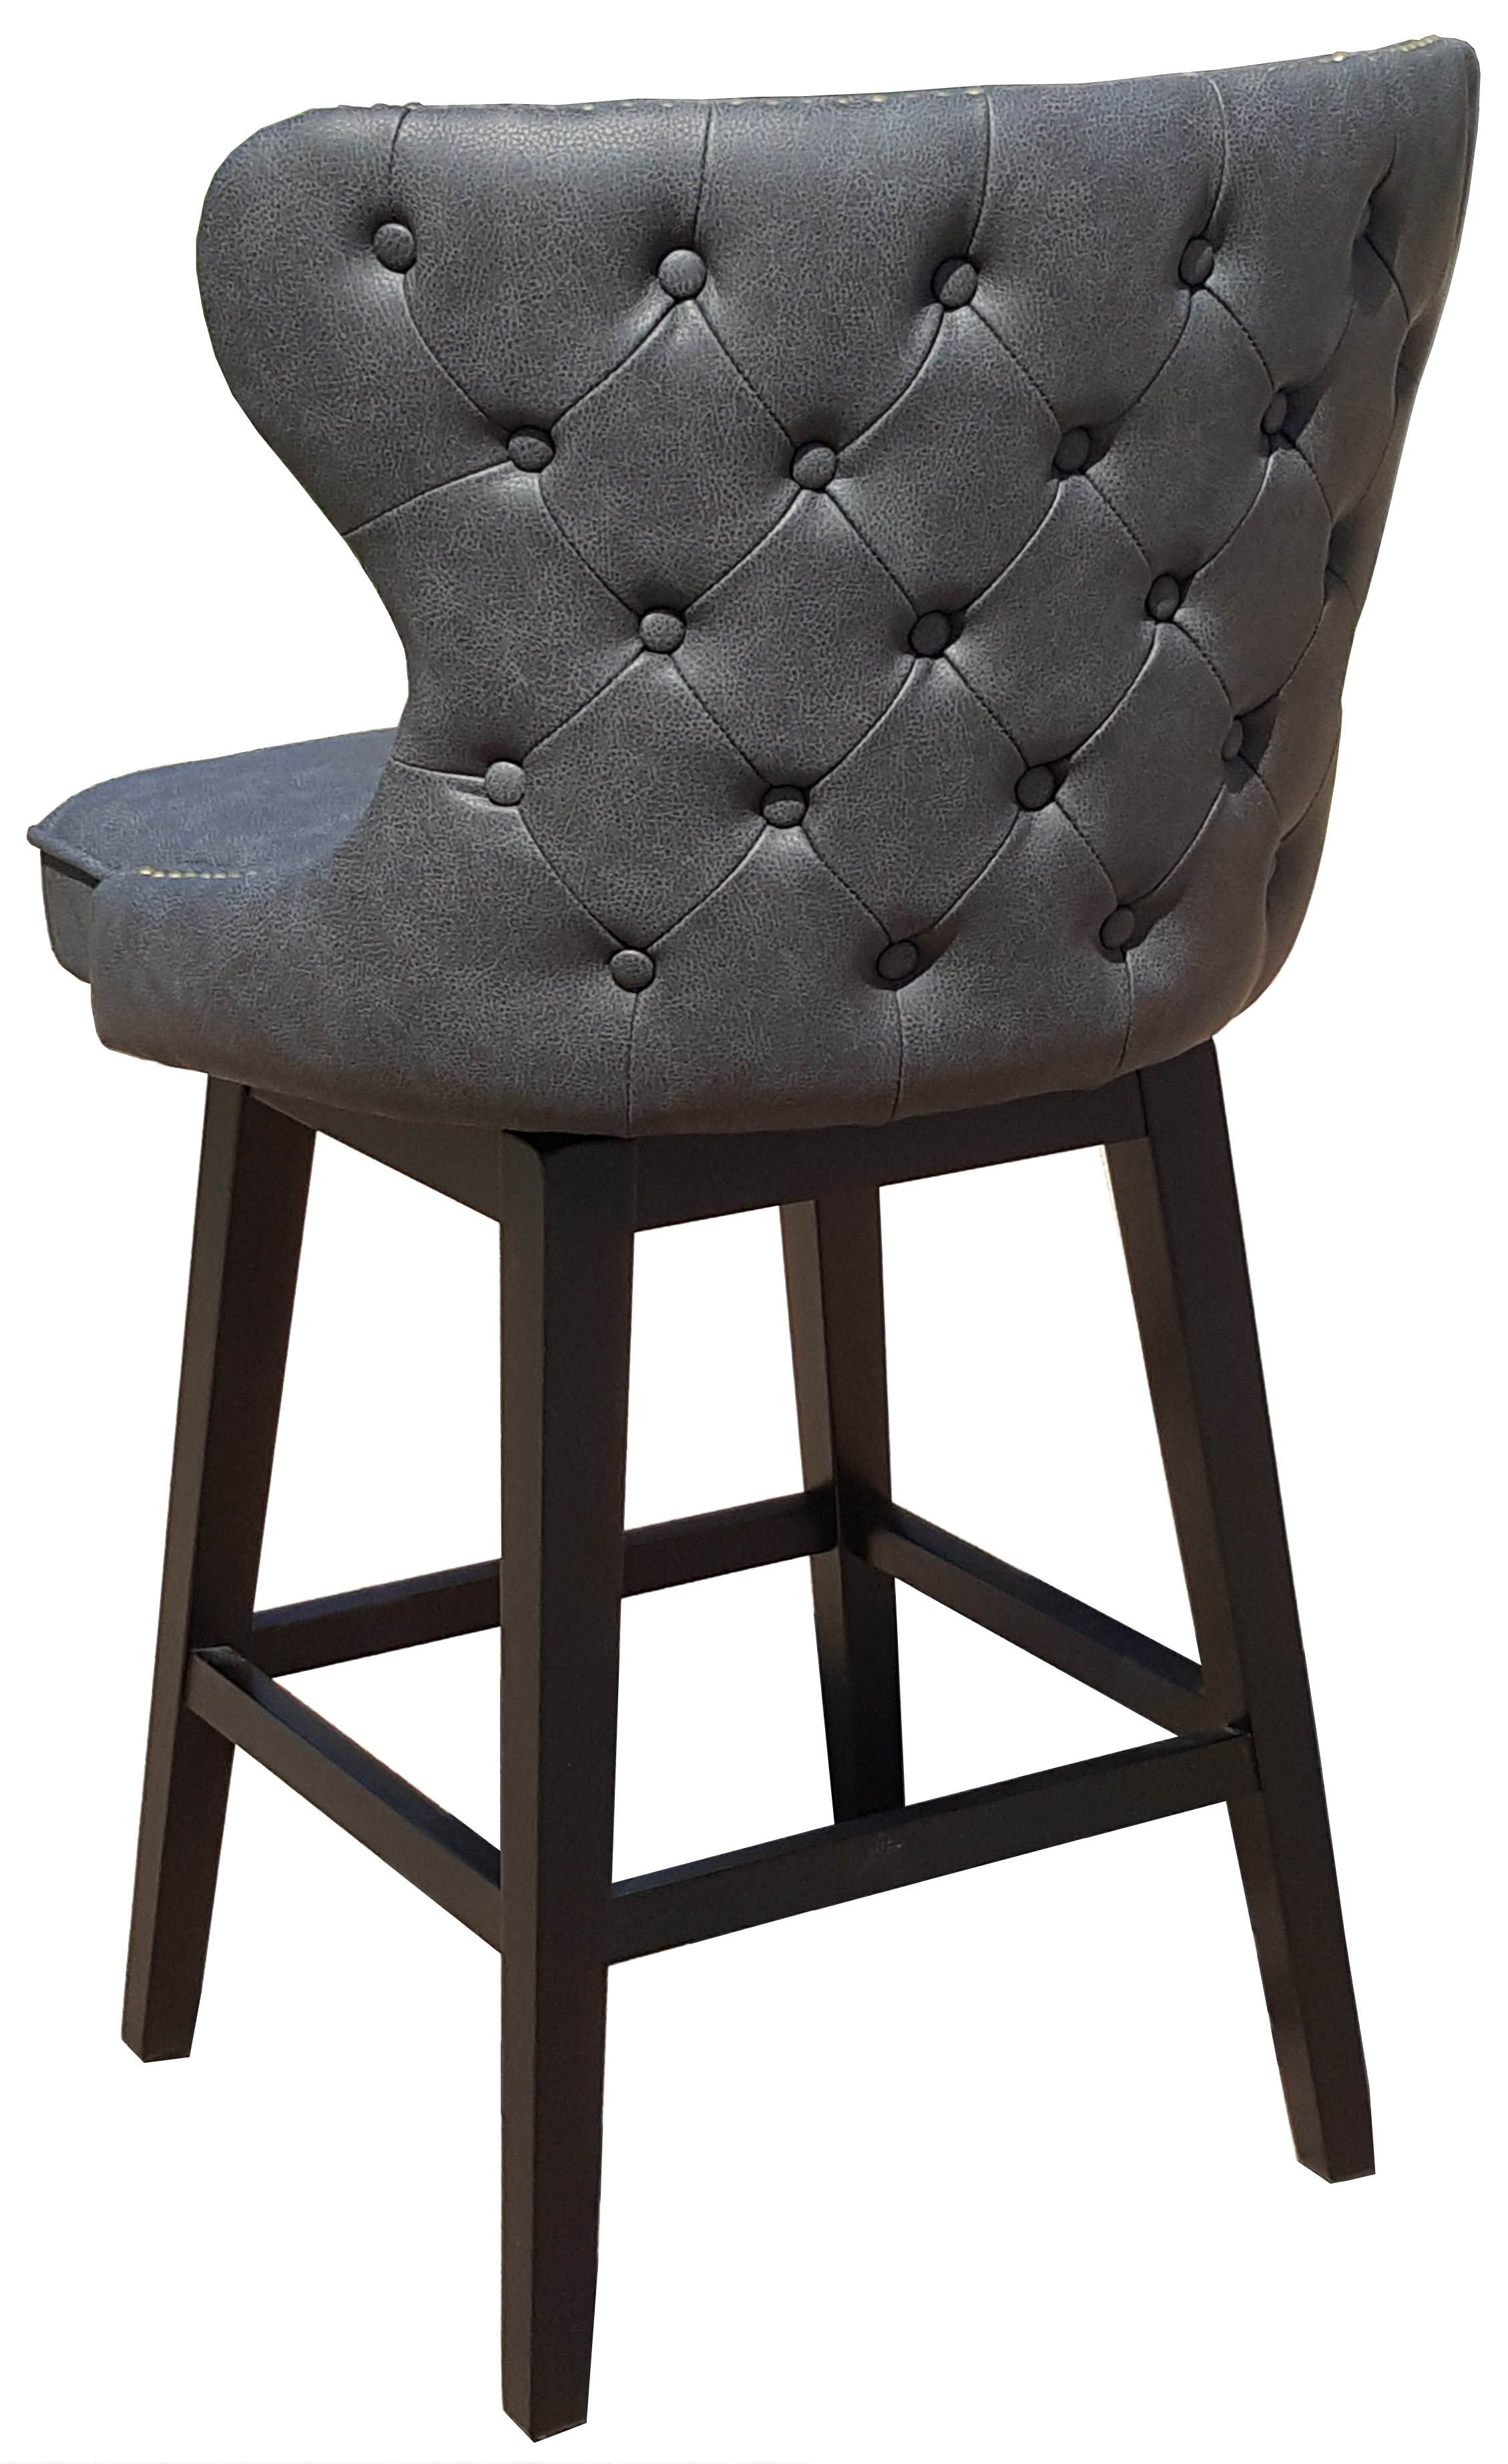 Magnificent Restaurant High Chairs Bistro Chairs R 8700 Swivel Creativecarmelina Interior Chair Design Creativecarmelinacom